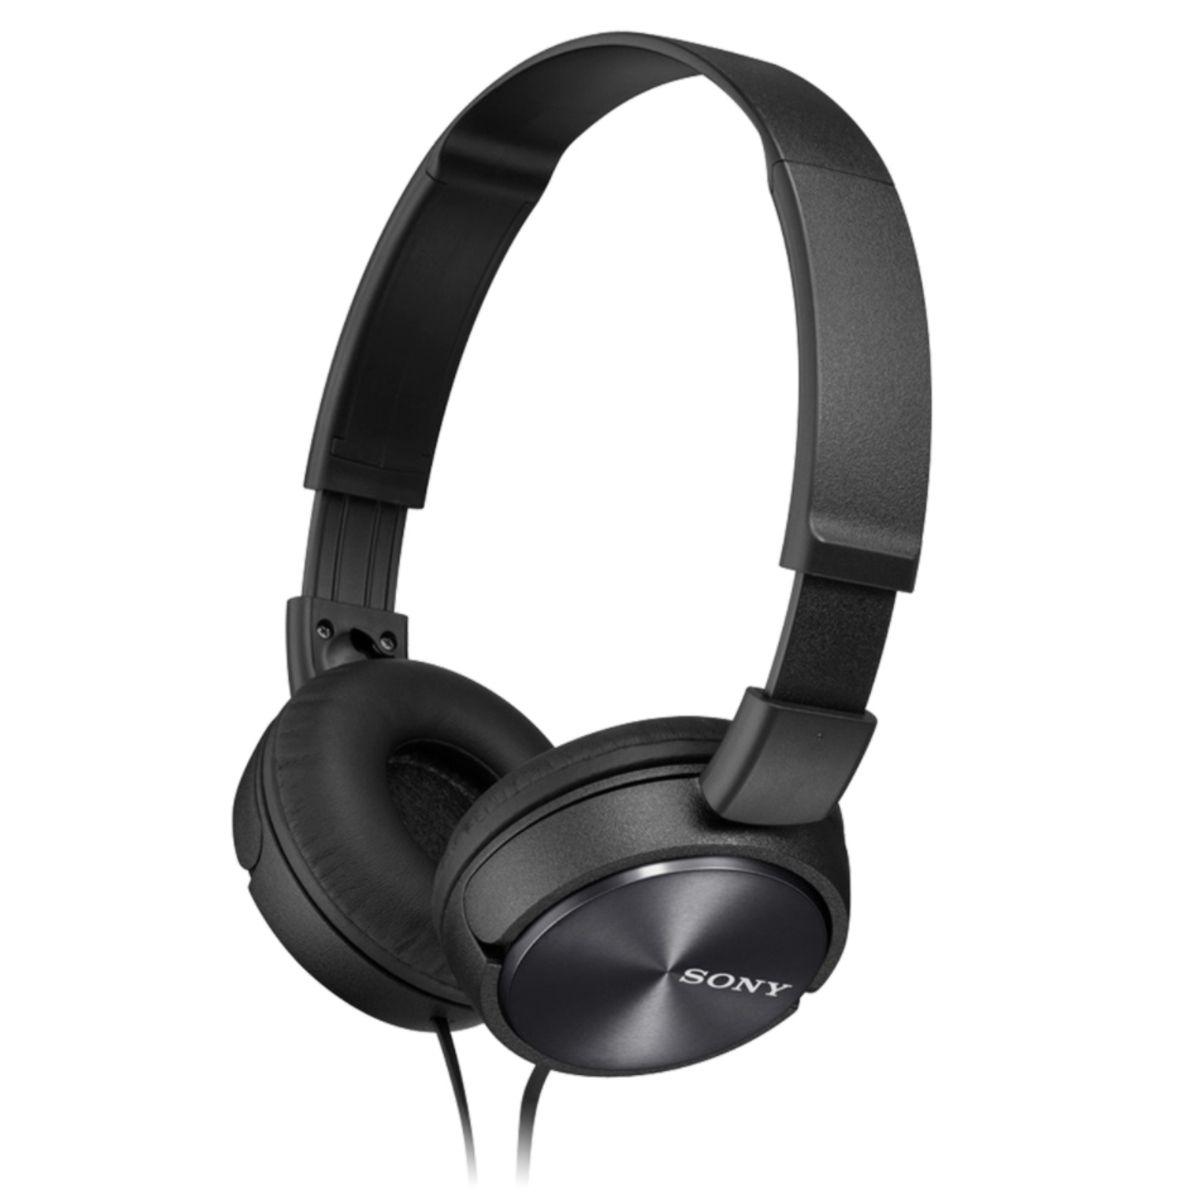 MDR-ZX310APB - Noir - Casque audio